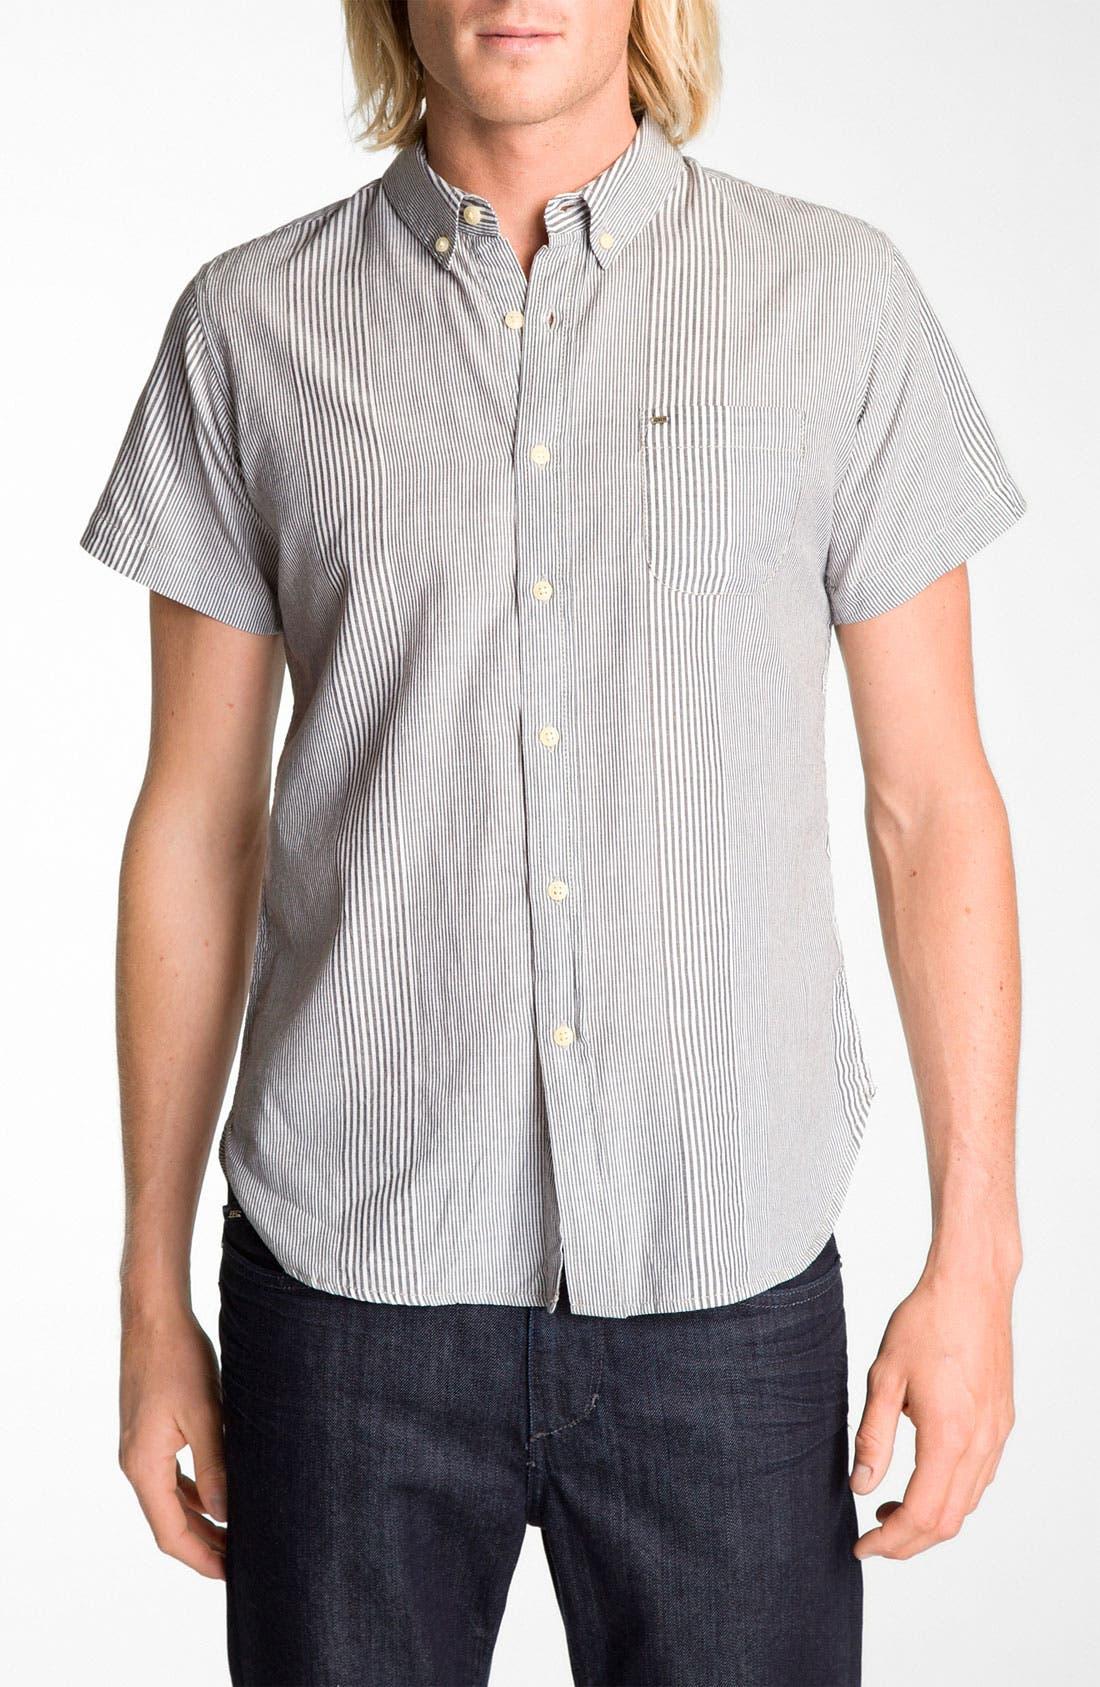 Main Image - Obey 'Wayne' Stripe Woven Shirt